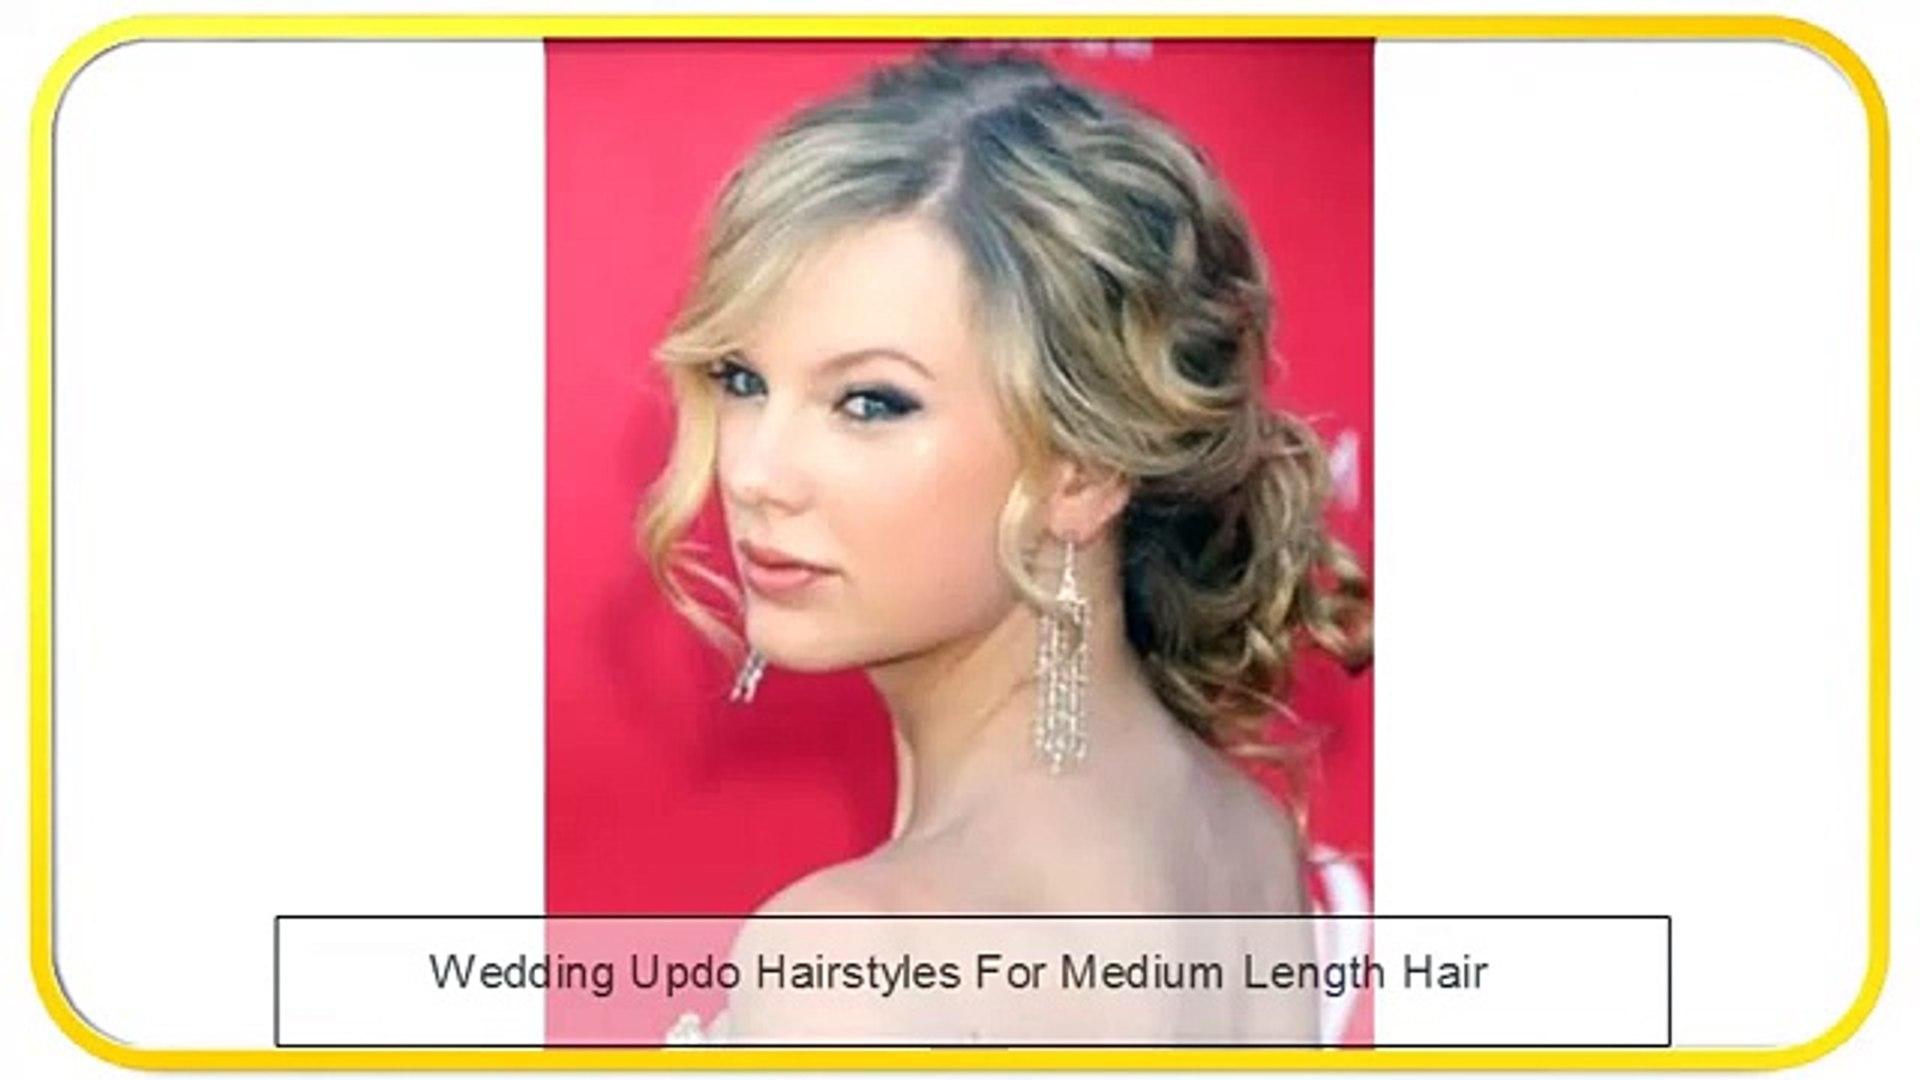 Wedding Updo Hairstyles For Medium Length Hair Video Dailymotion